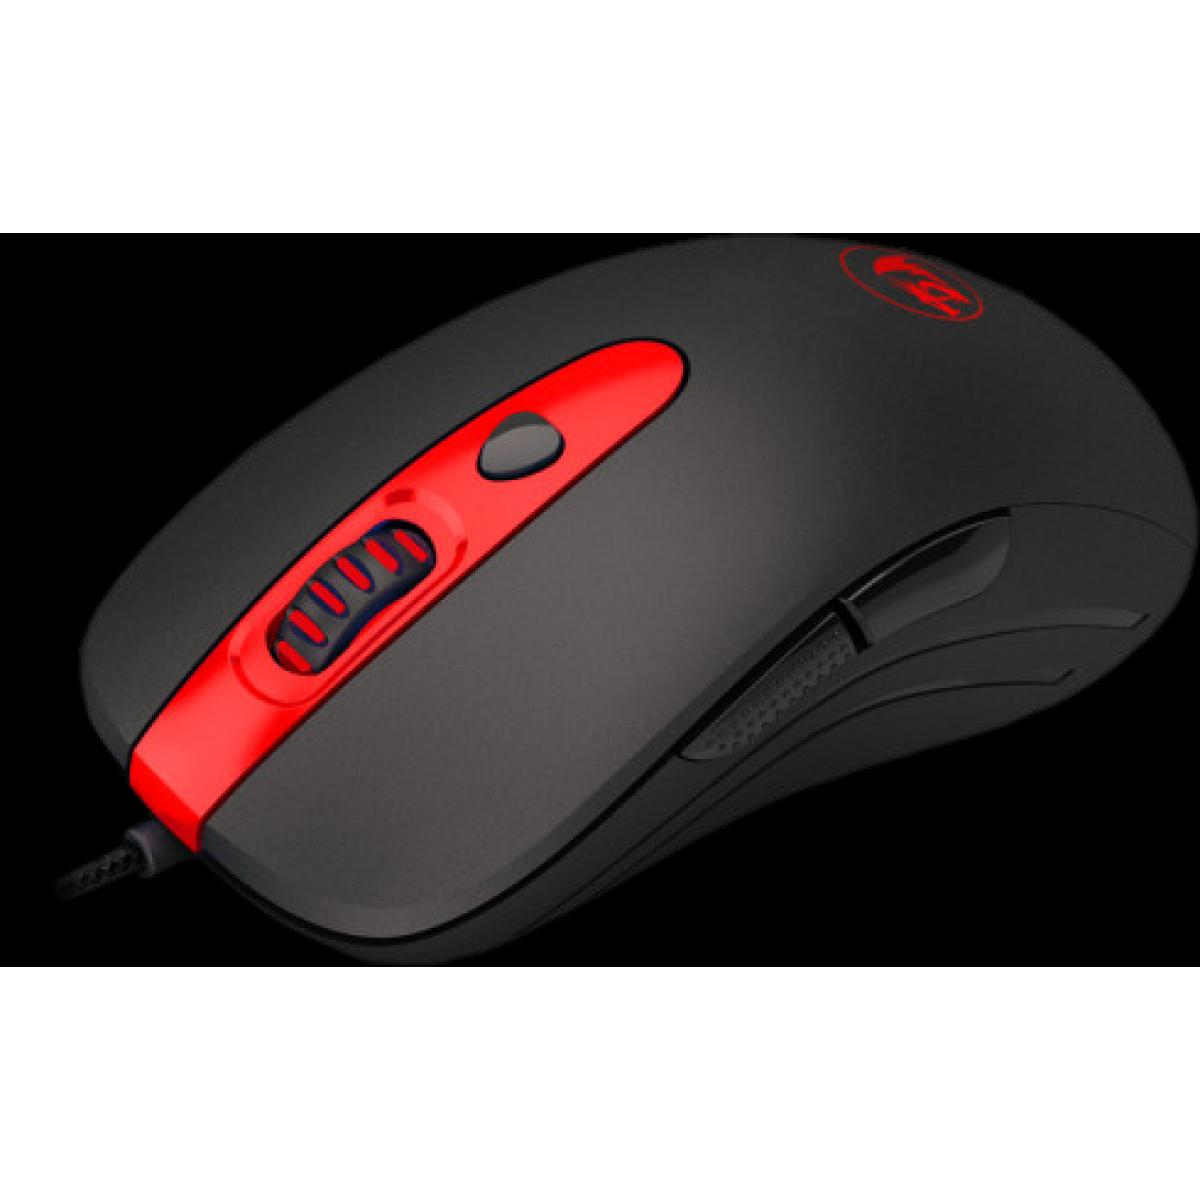 Mouse Gamer Redragon Cerberus M703 RGB, 7200 DPI, 6 Botões, Black